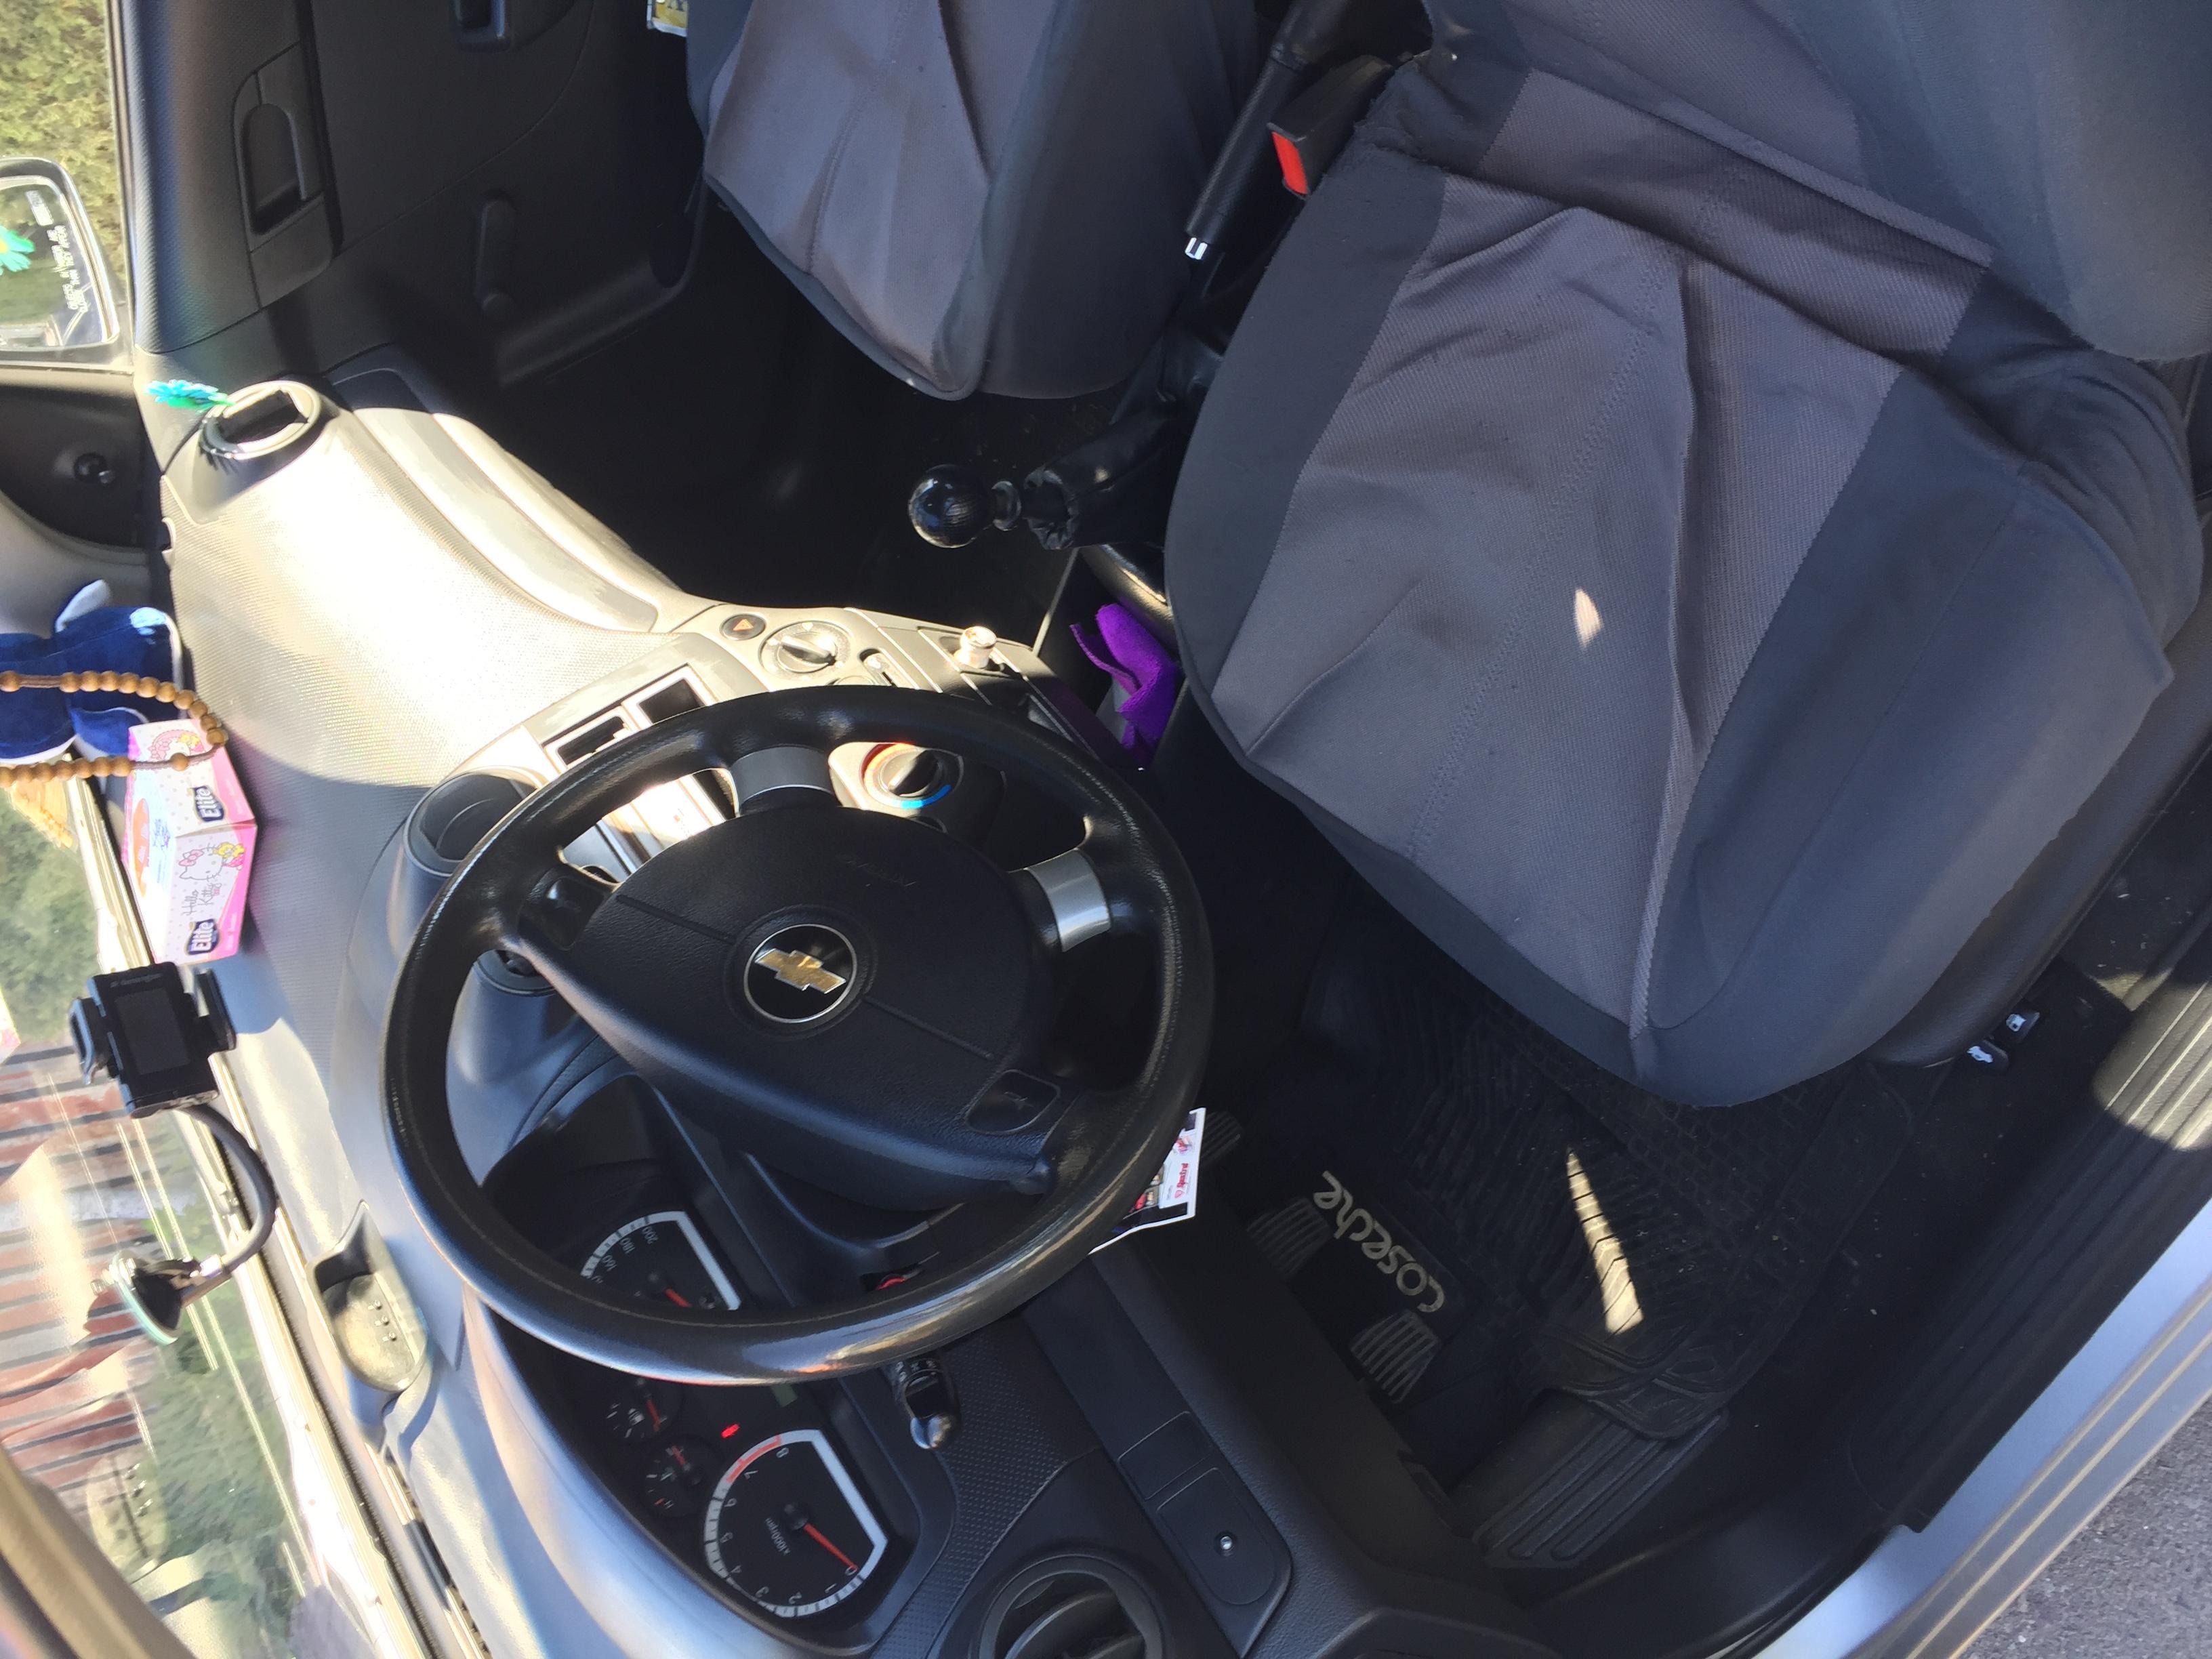 Chevrolet Aveo III Hatchback 1.4 cc año 2010